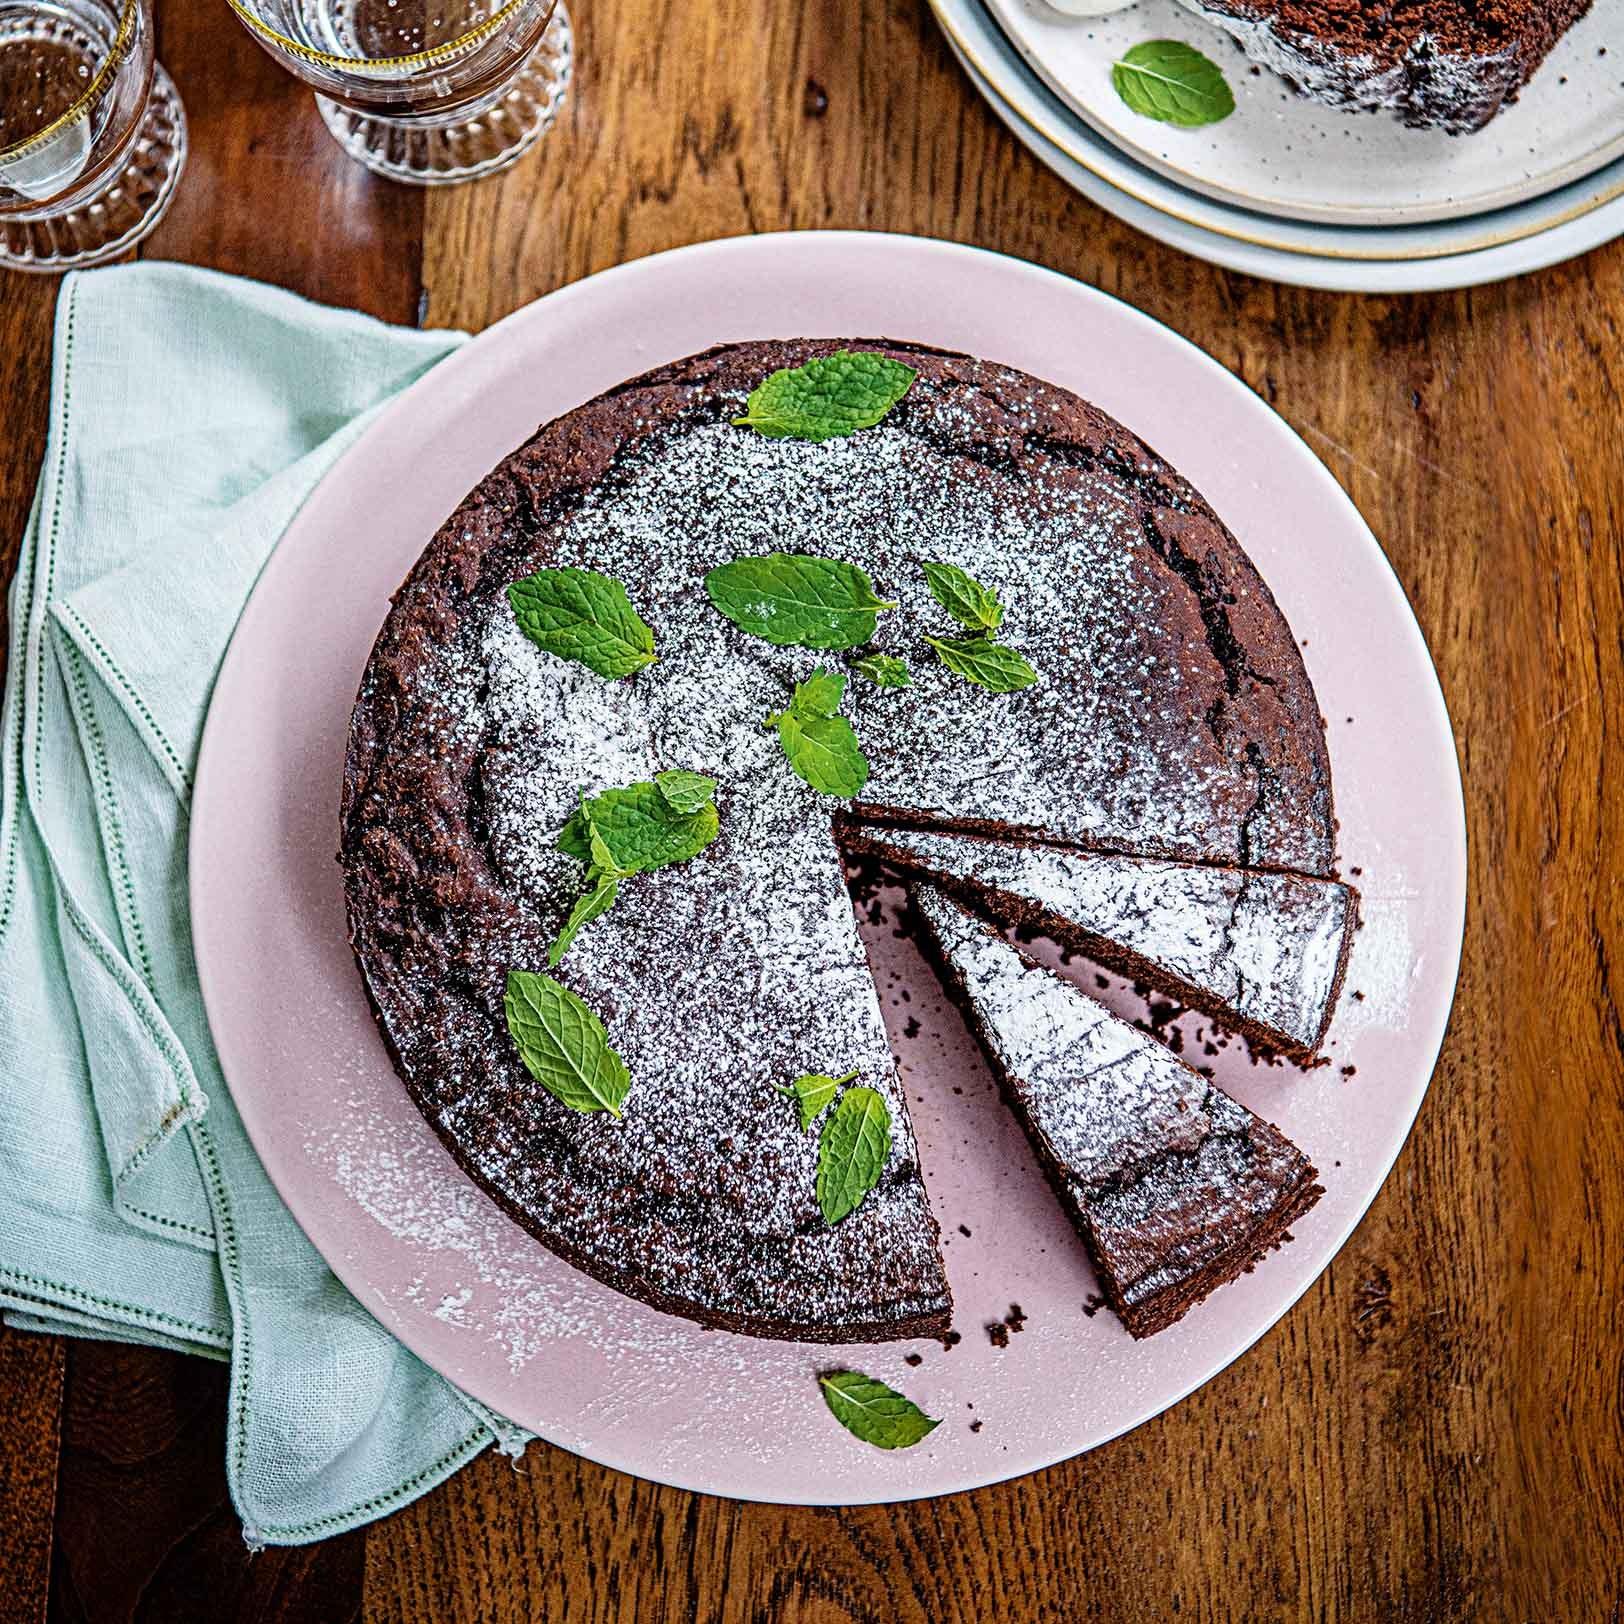 Photo of Avocado chocolate cake by WW